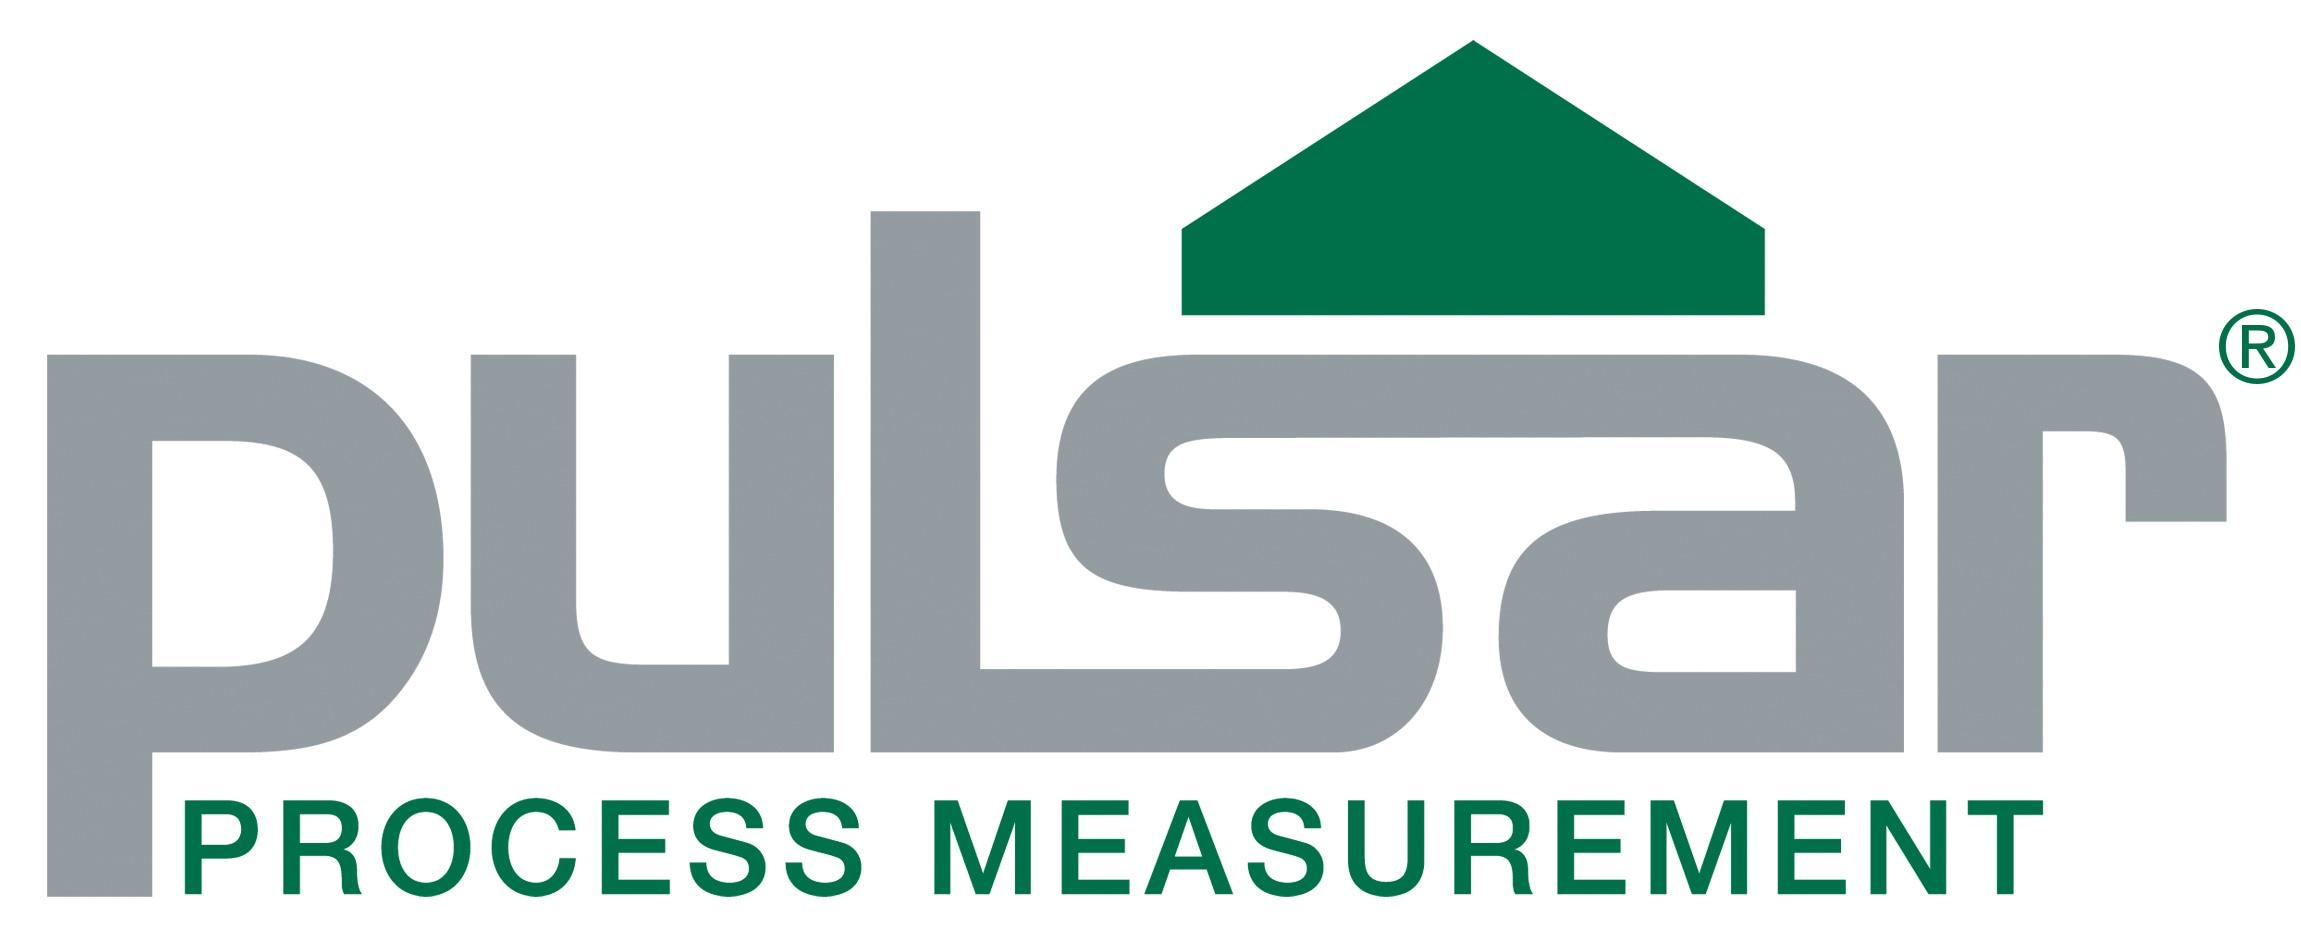 Pulsar Process Measurement